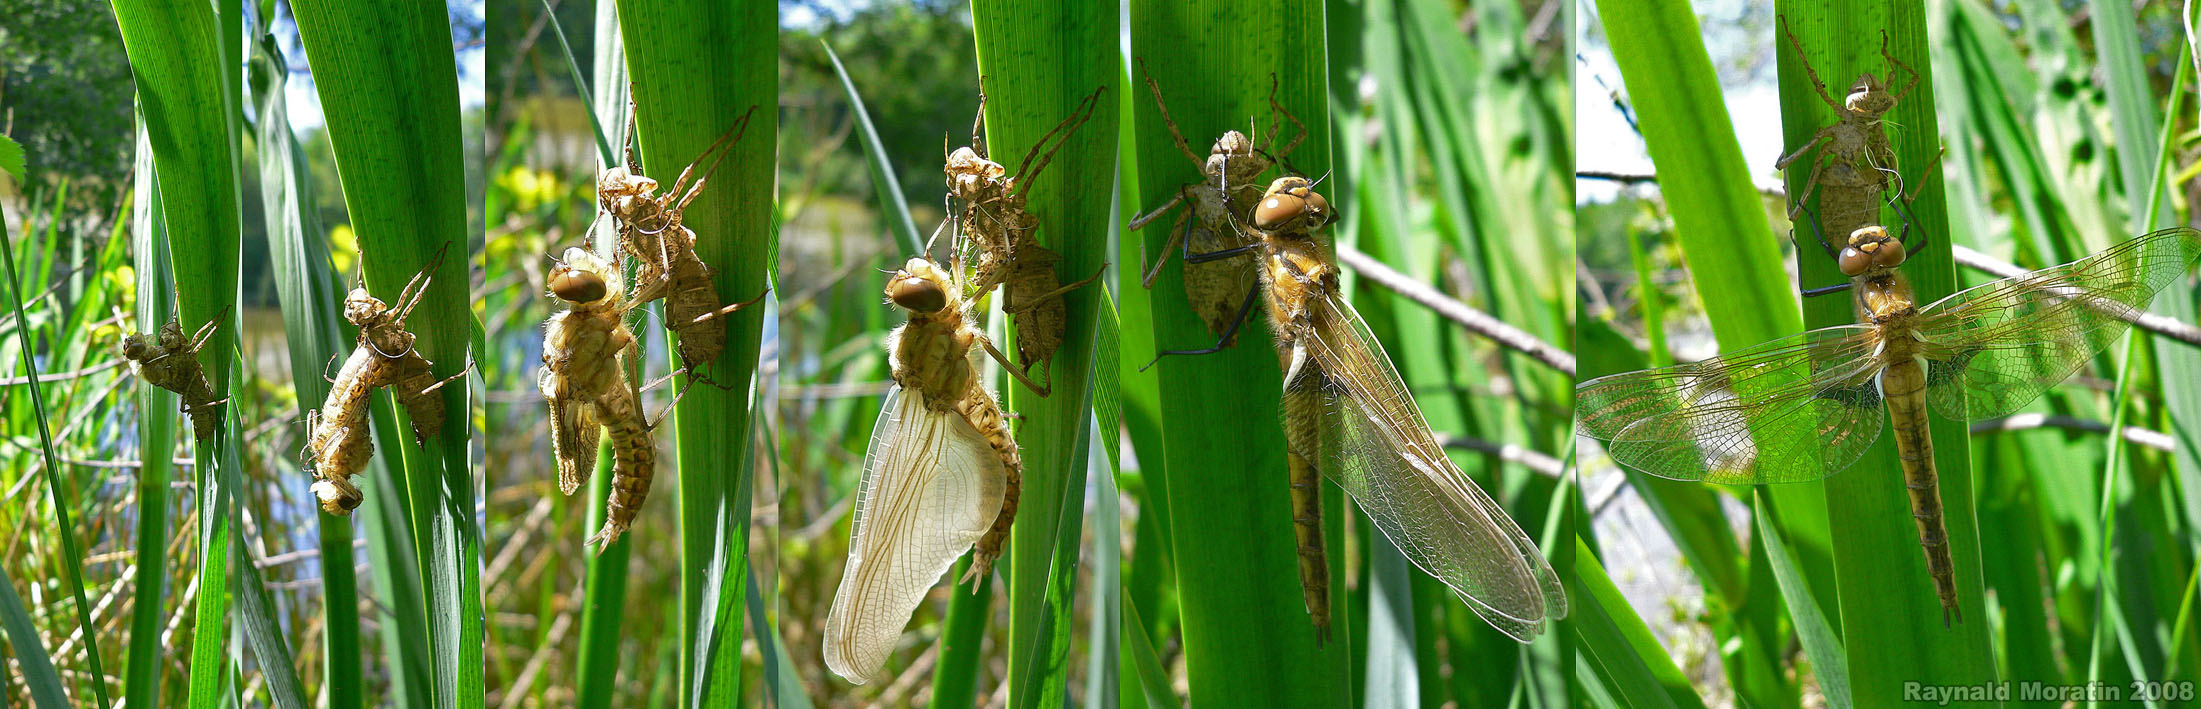 https://cdnfiles2.biolovision.net/www.faune-alsace.org/userfiles/Insectes/epitheca/EpiBimaRMoratincond.jpg